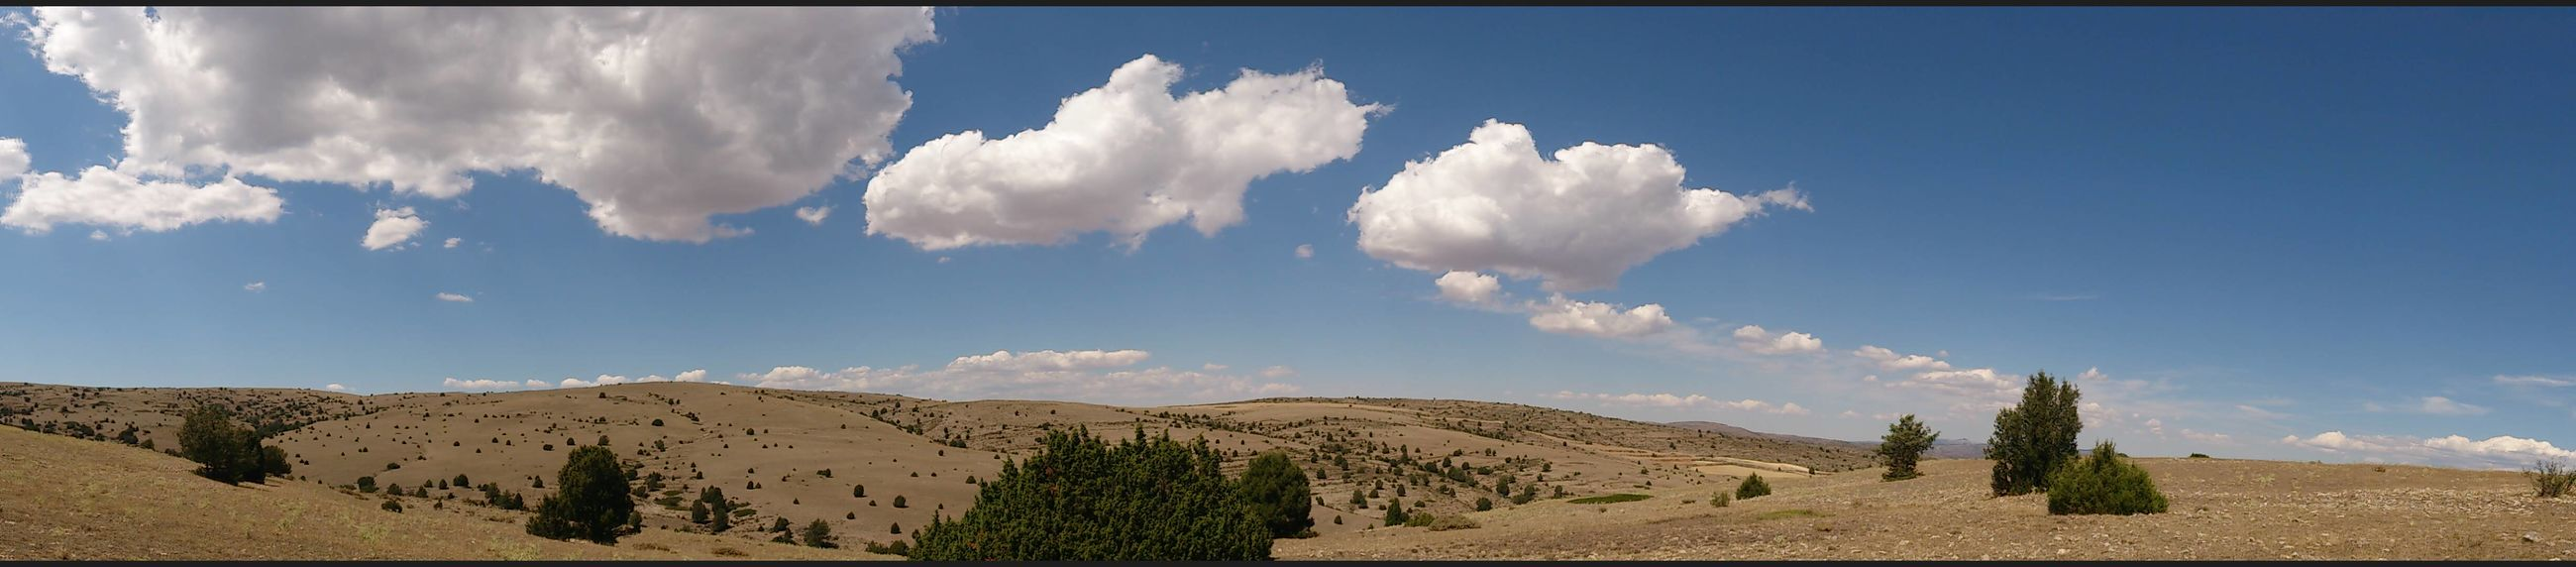 Panoramic Pano Panoramic Photography Panoramic Landscape Panorama View Panorámica Sony Xperia Photography. Cloud - Sky Landscape Outdoors Landscape_Collection Landscape Photography Javalambre Aragón Teruelbeautiful Aragon, Spain Teruel